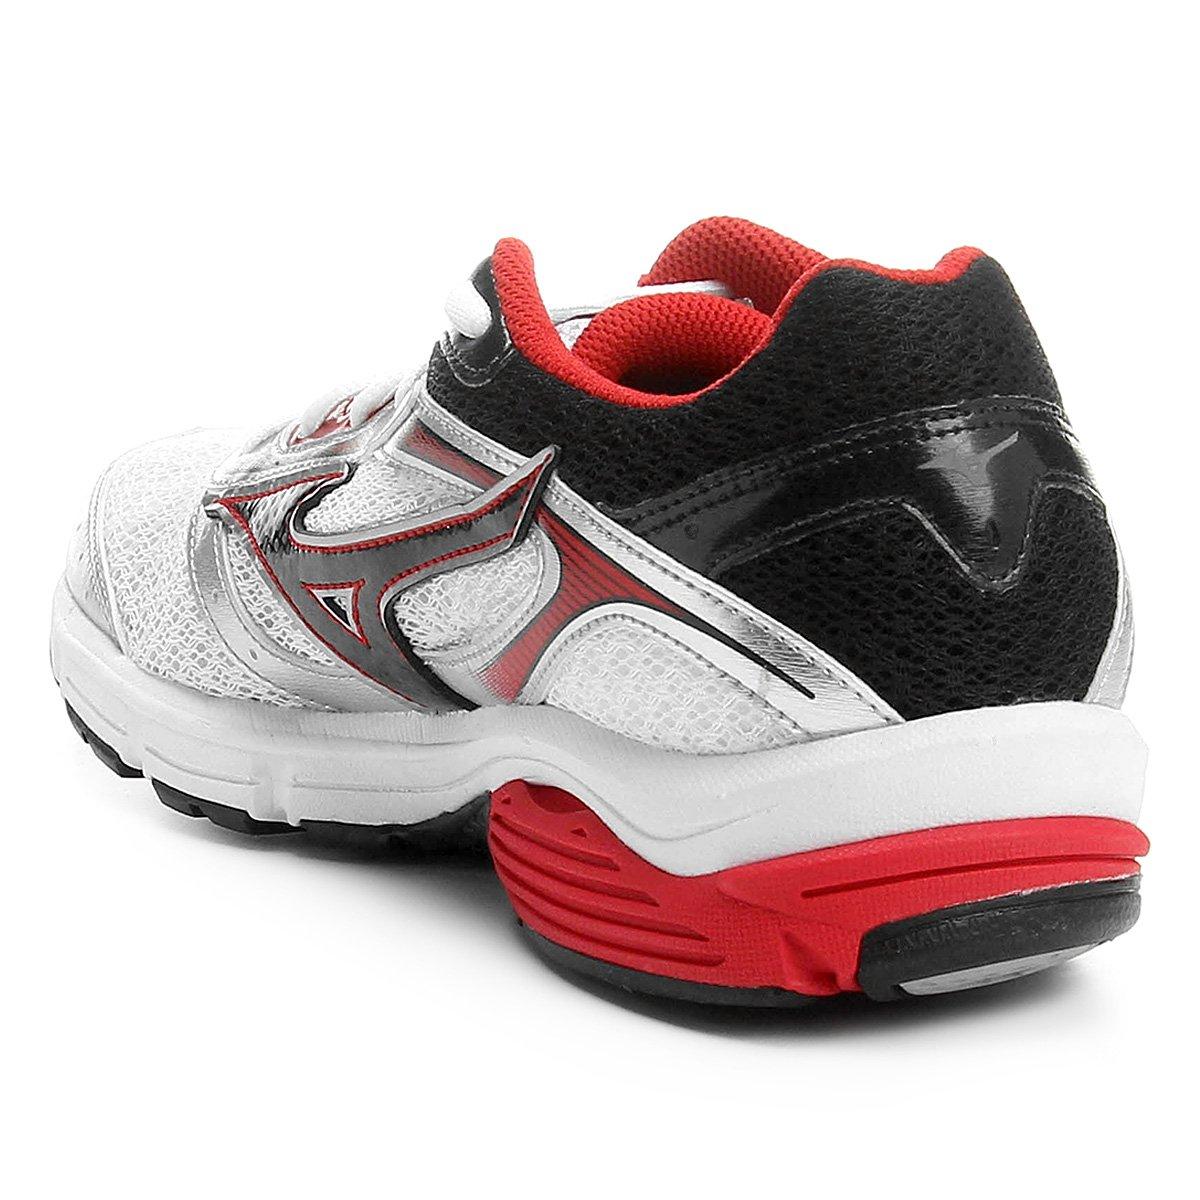 Tênis Mizuno Wave Impetus 4 Masculino - Branco e Vermelho - Compre ... 21bd9017d4b33